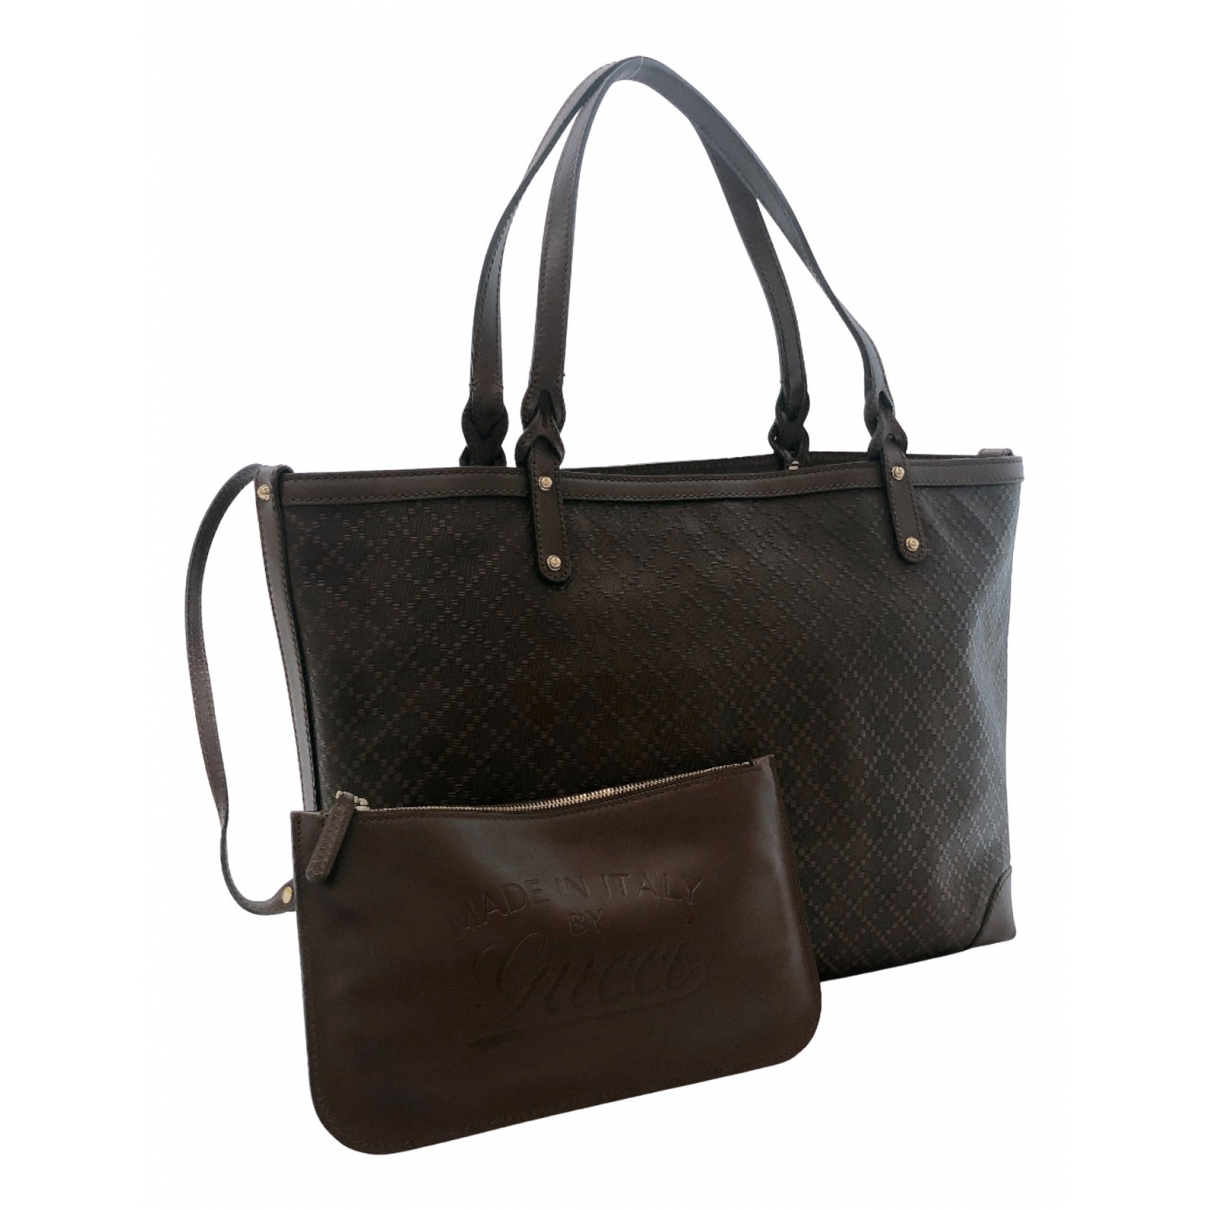 Gucci N Brown Leather handbag for Women N